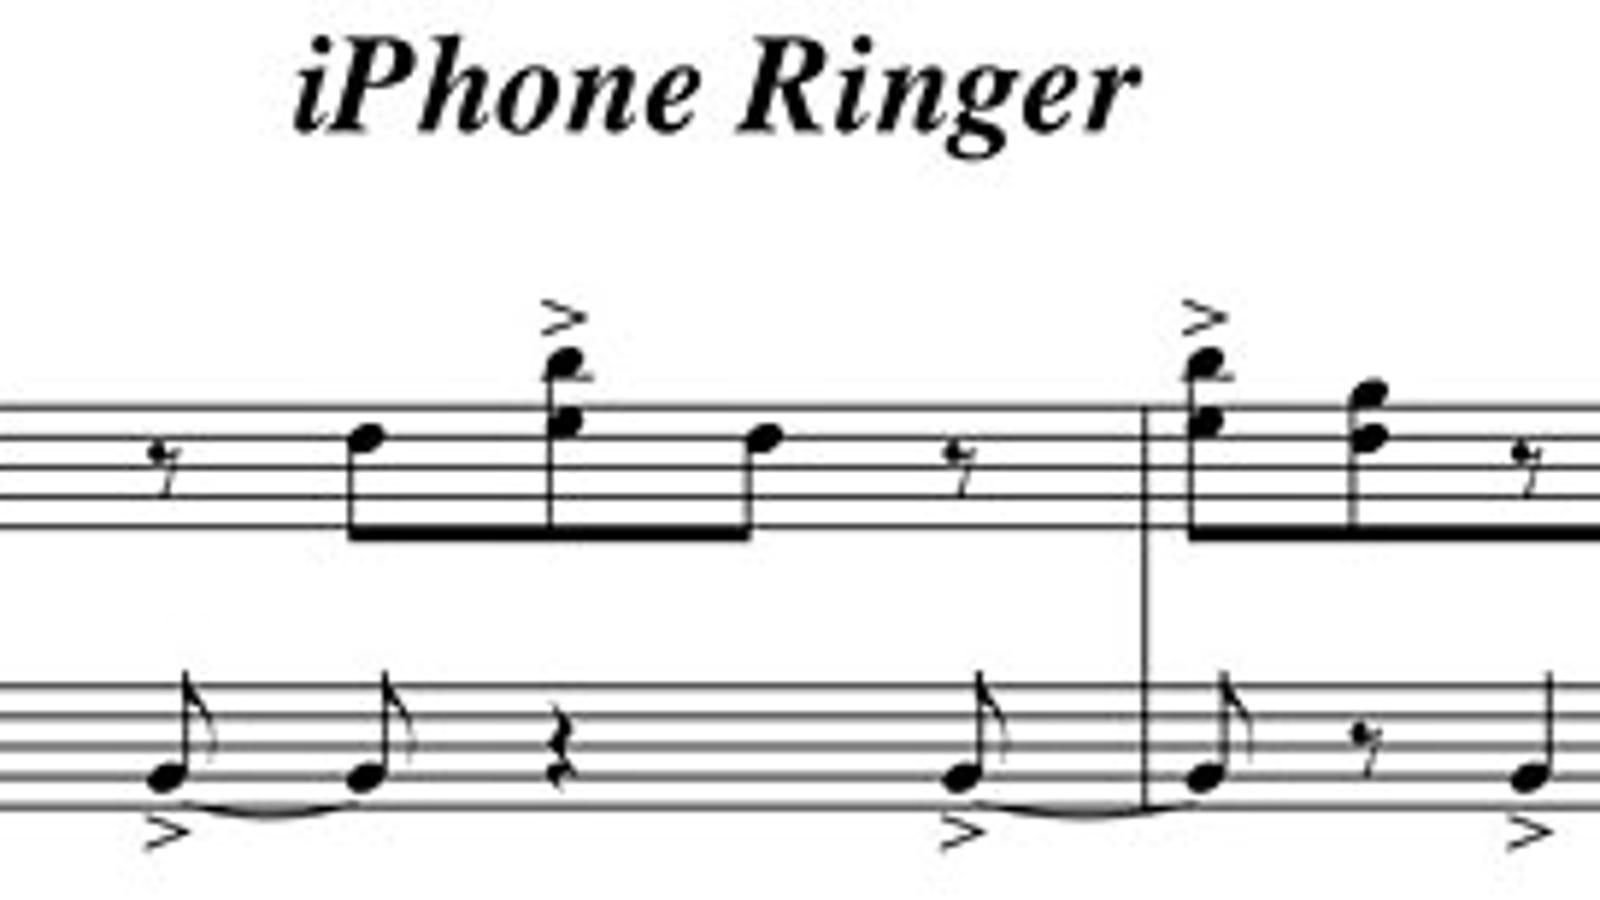 apple iphone original ringtone remix download